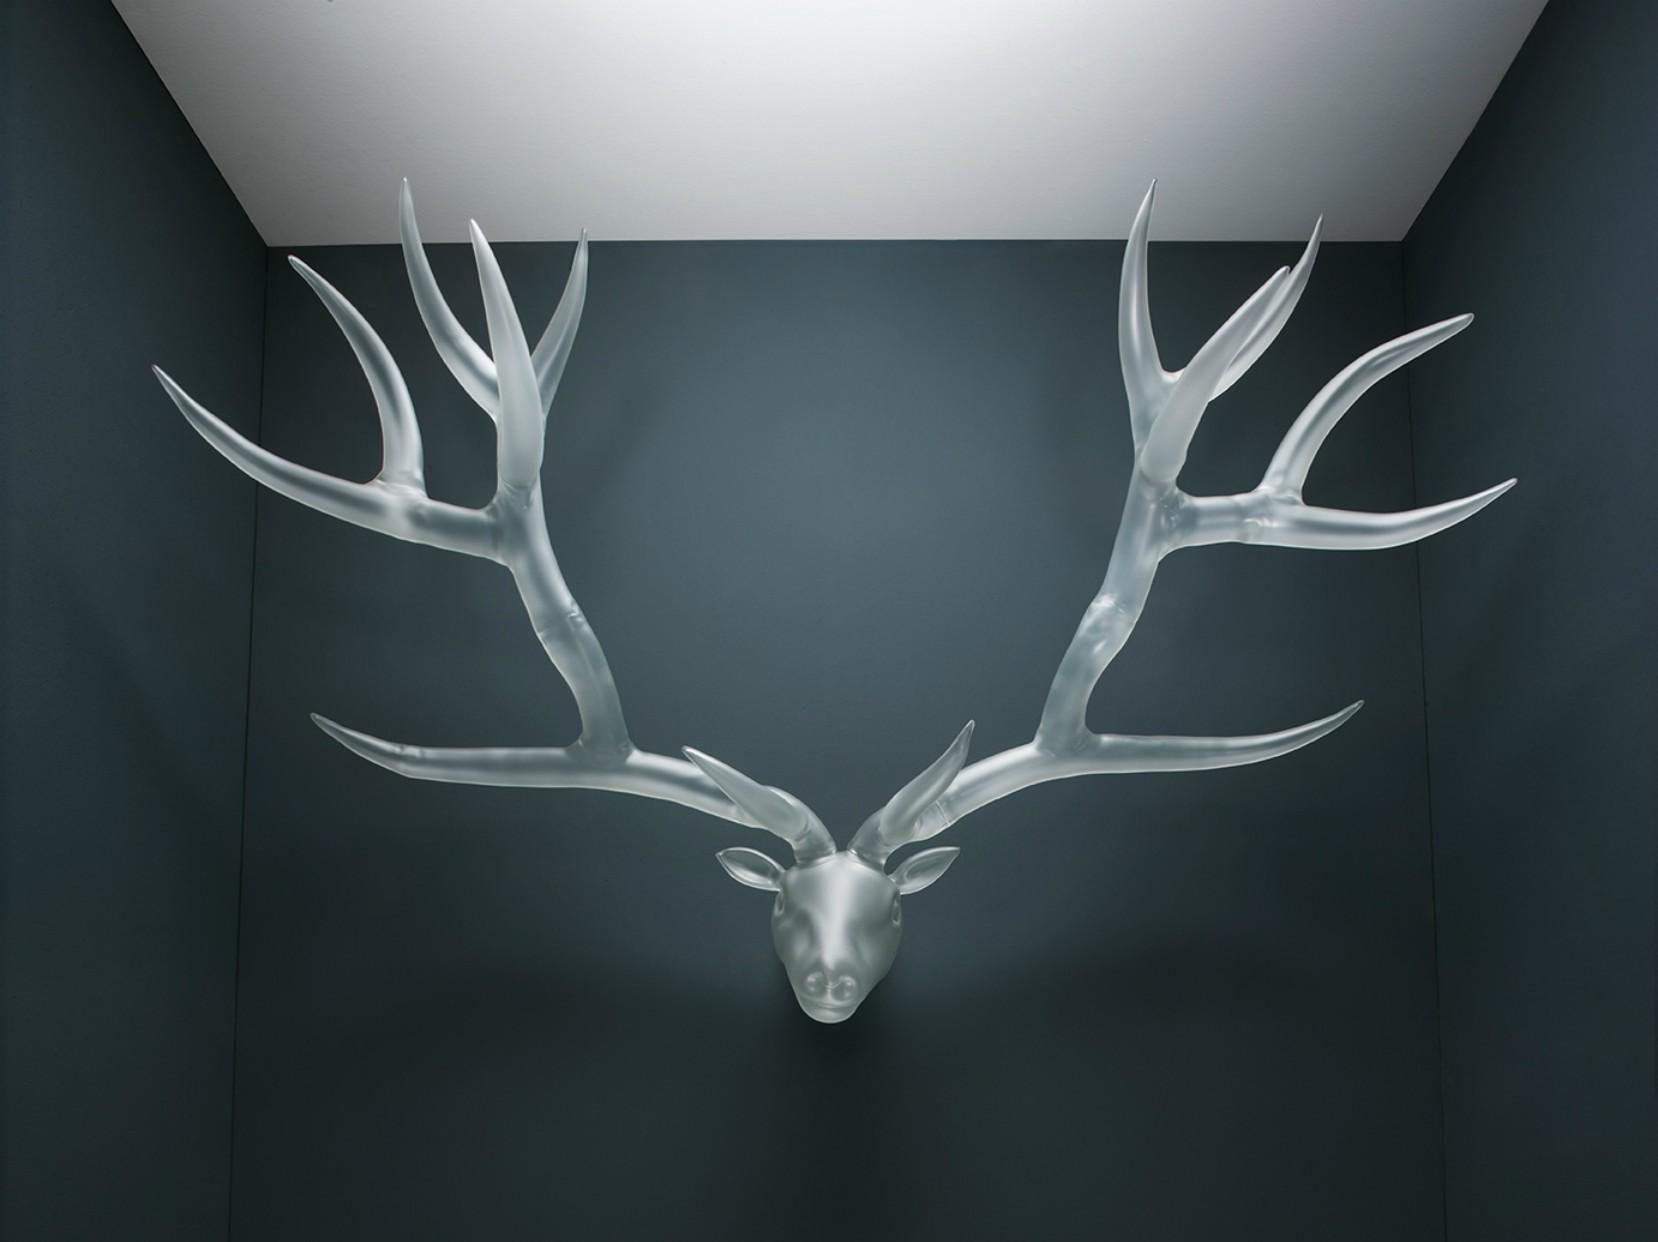 Glass modern trophy - Simone Crestani